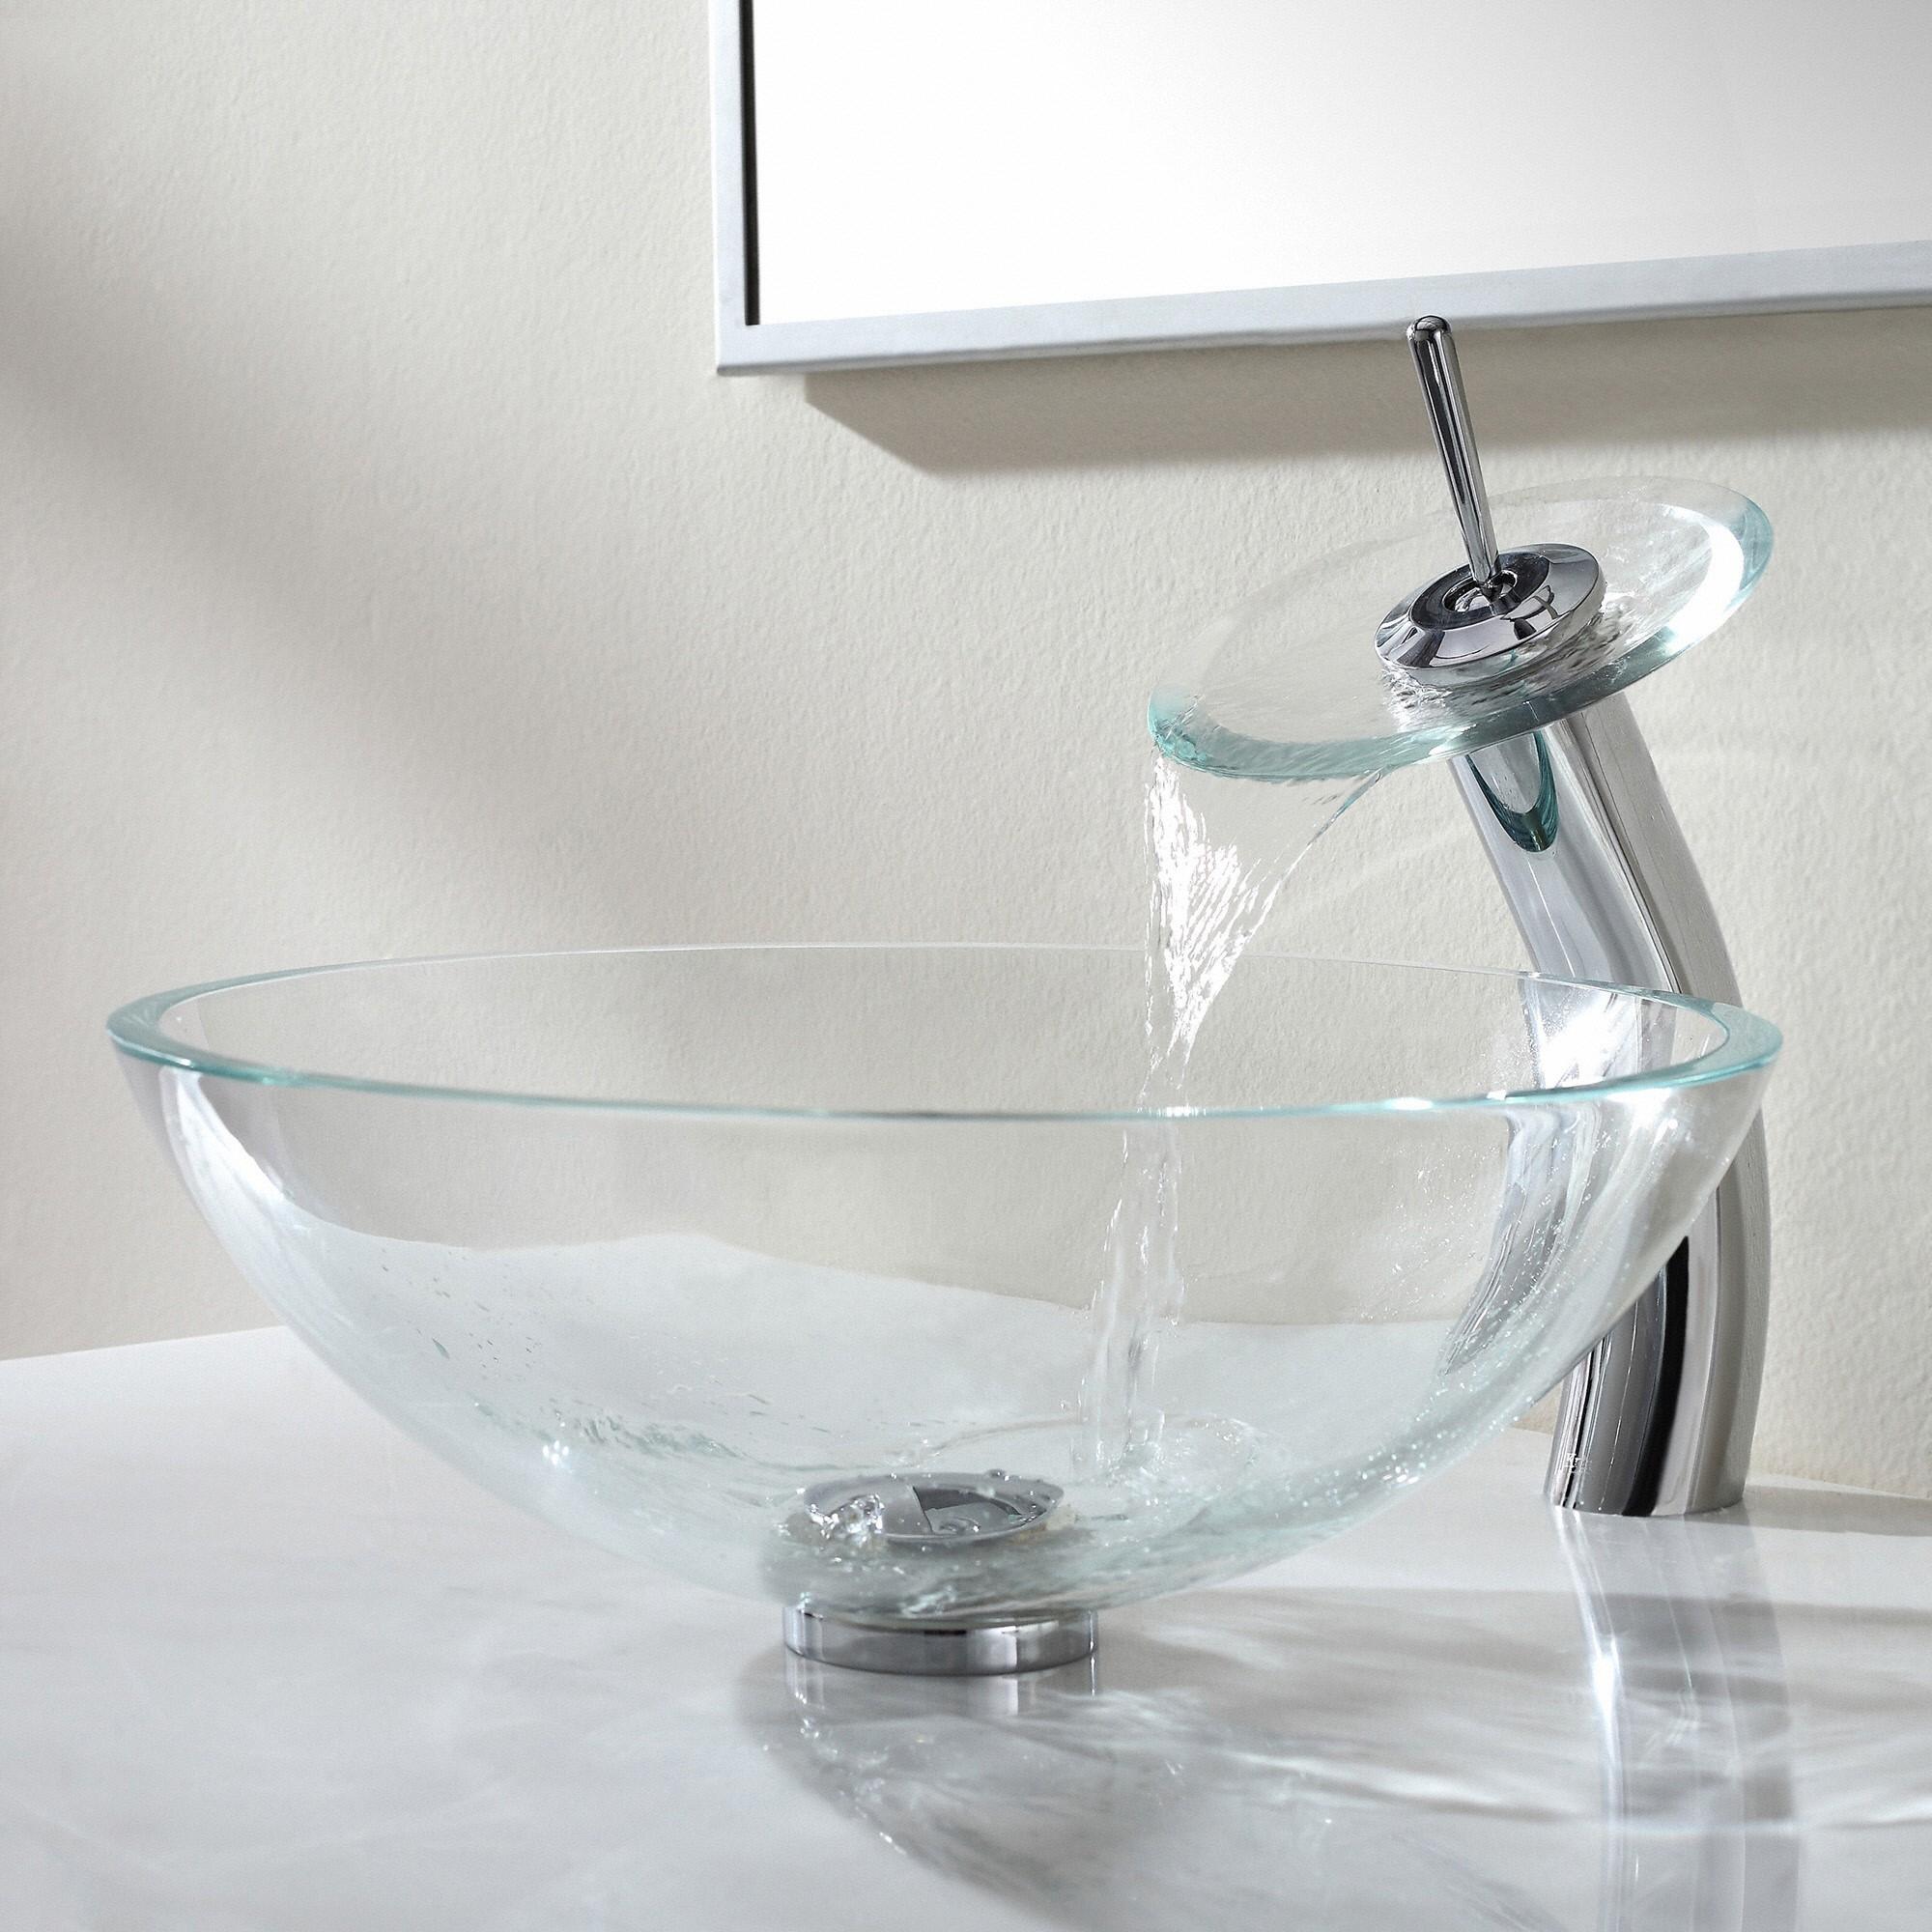 Ideas, glass bathroom faucet handles glass bathroom faucet handles bathroom waterfall faucet kraususa 2000 x 2000 2  .